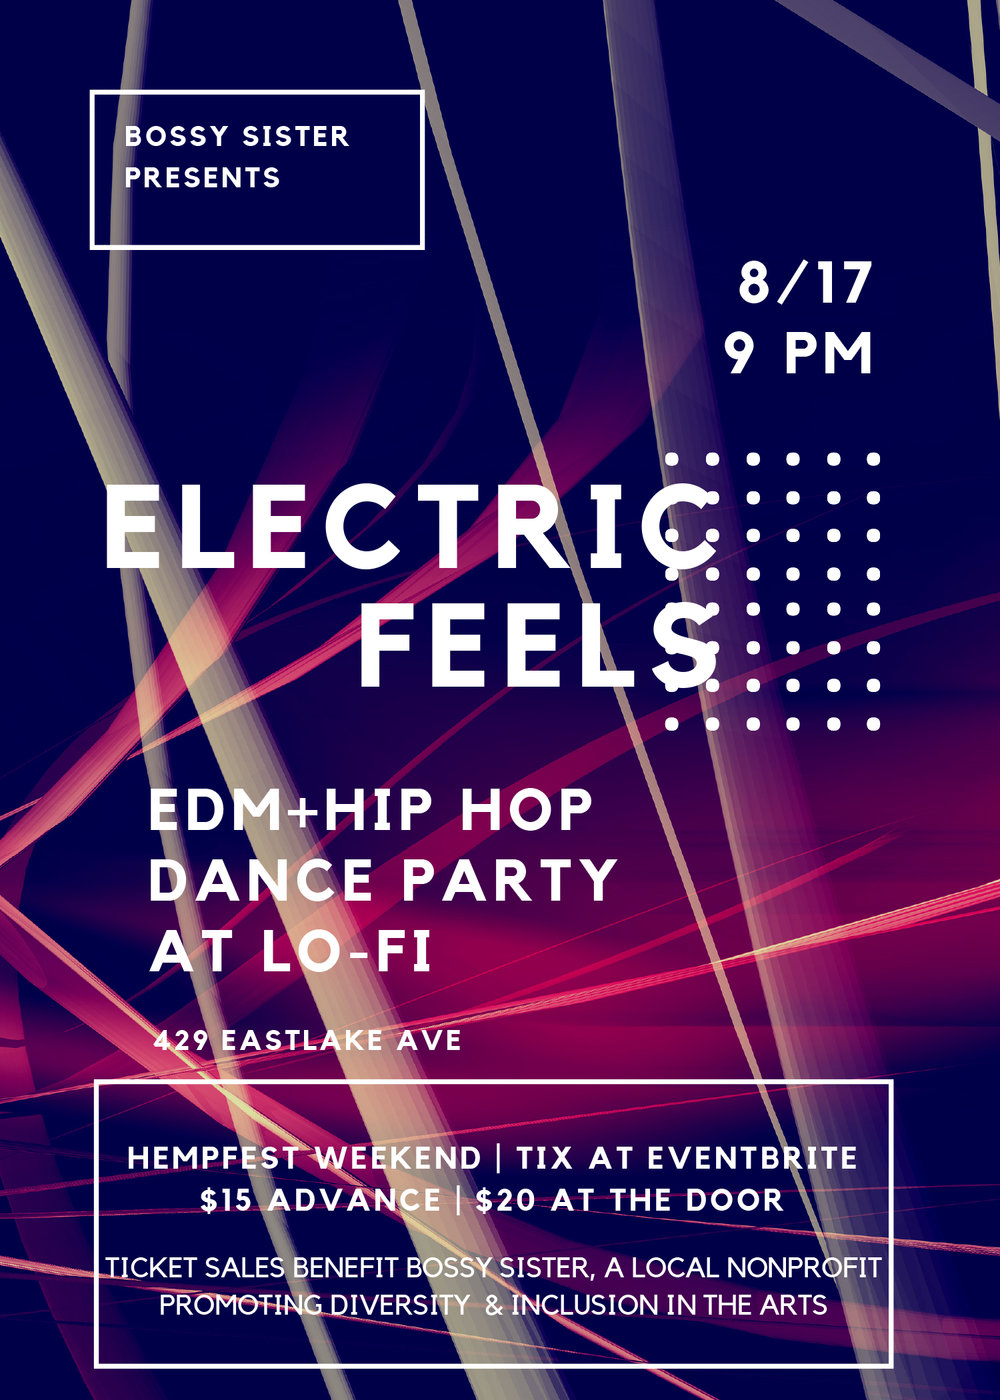 Electro House Flyer.jpg